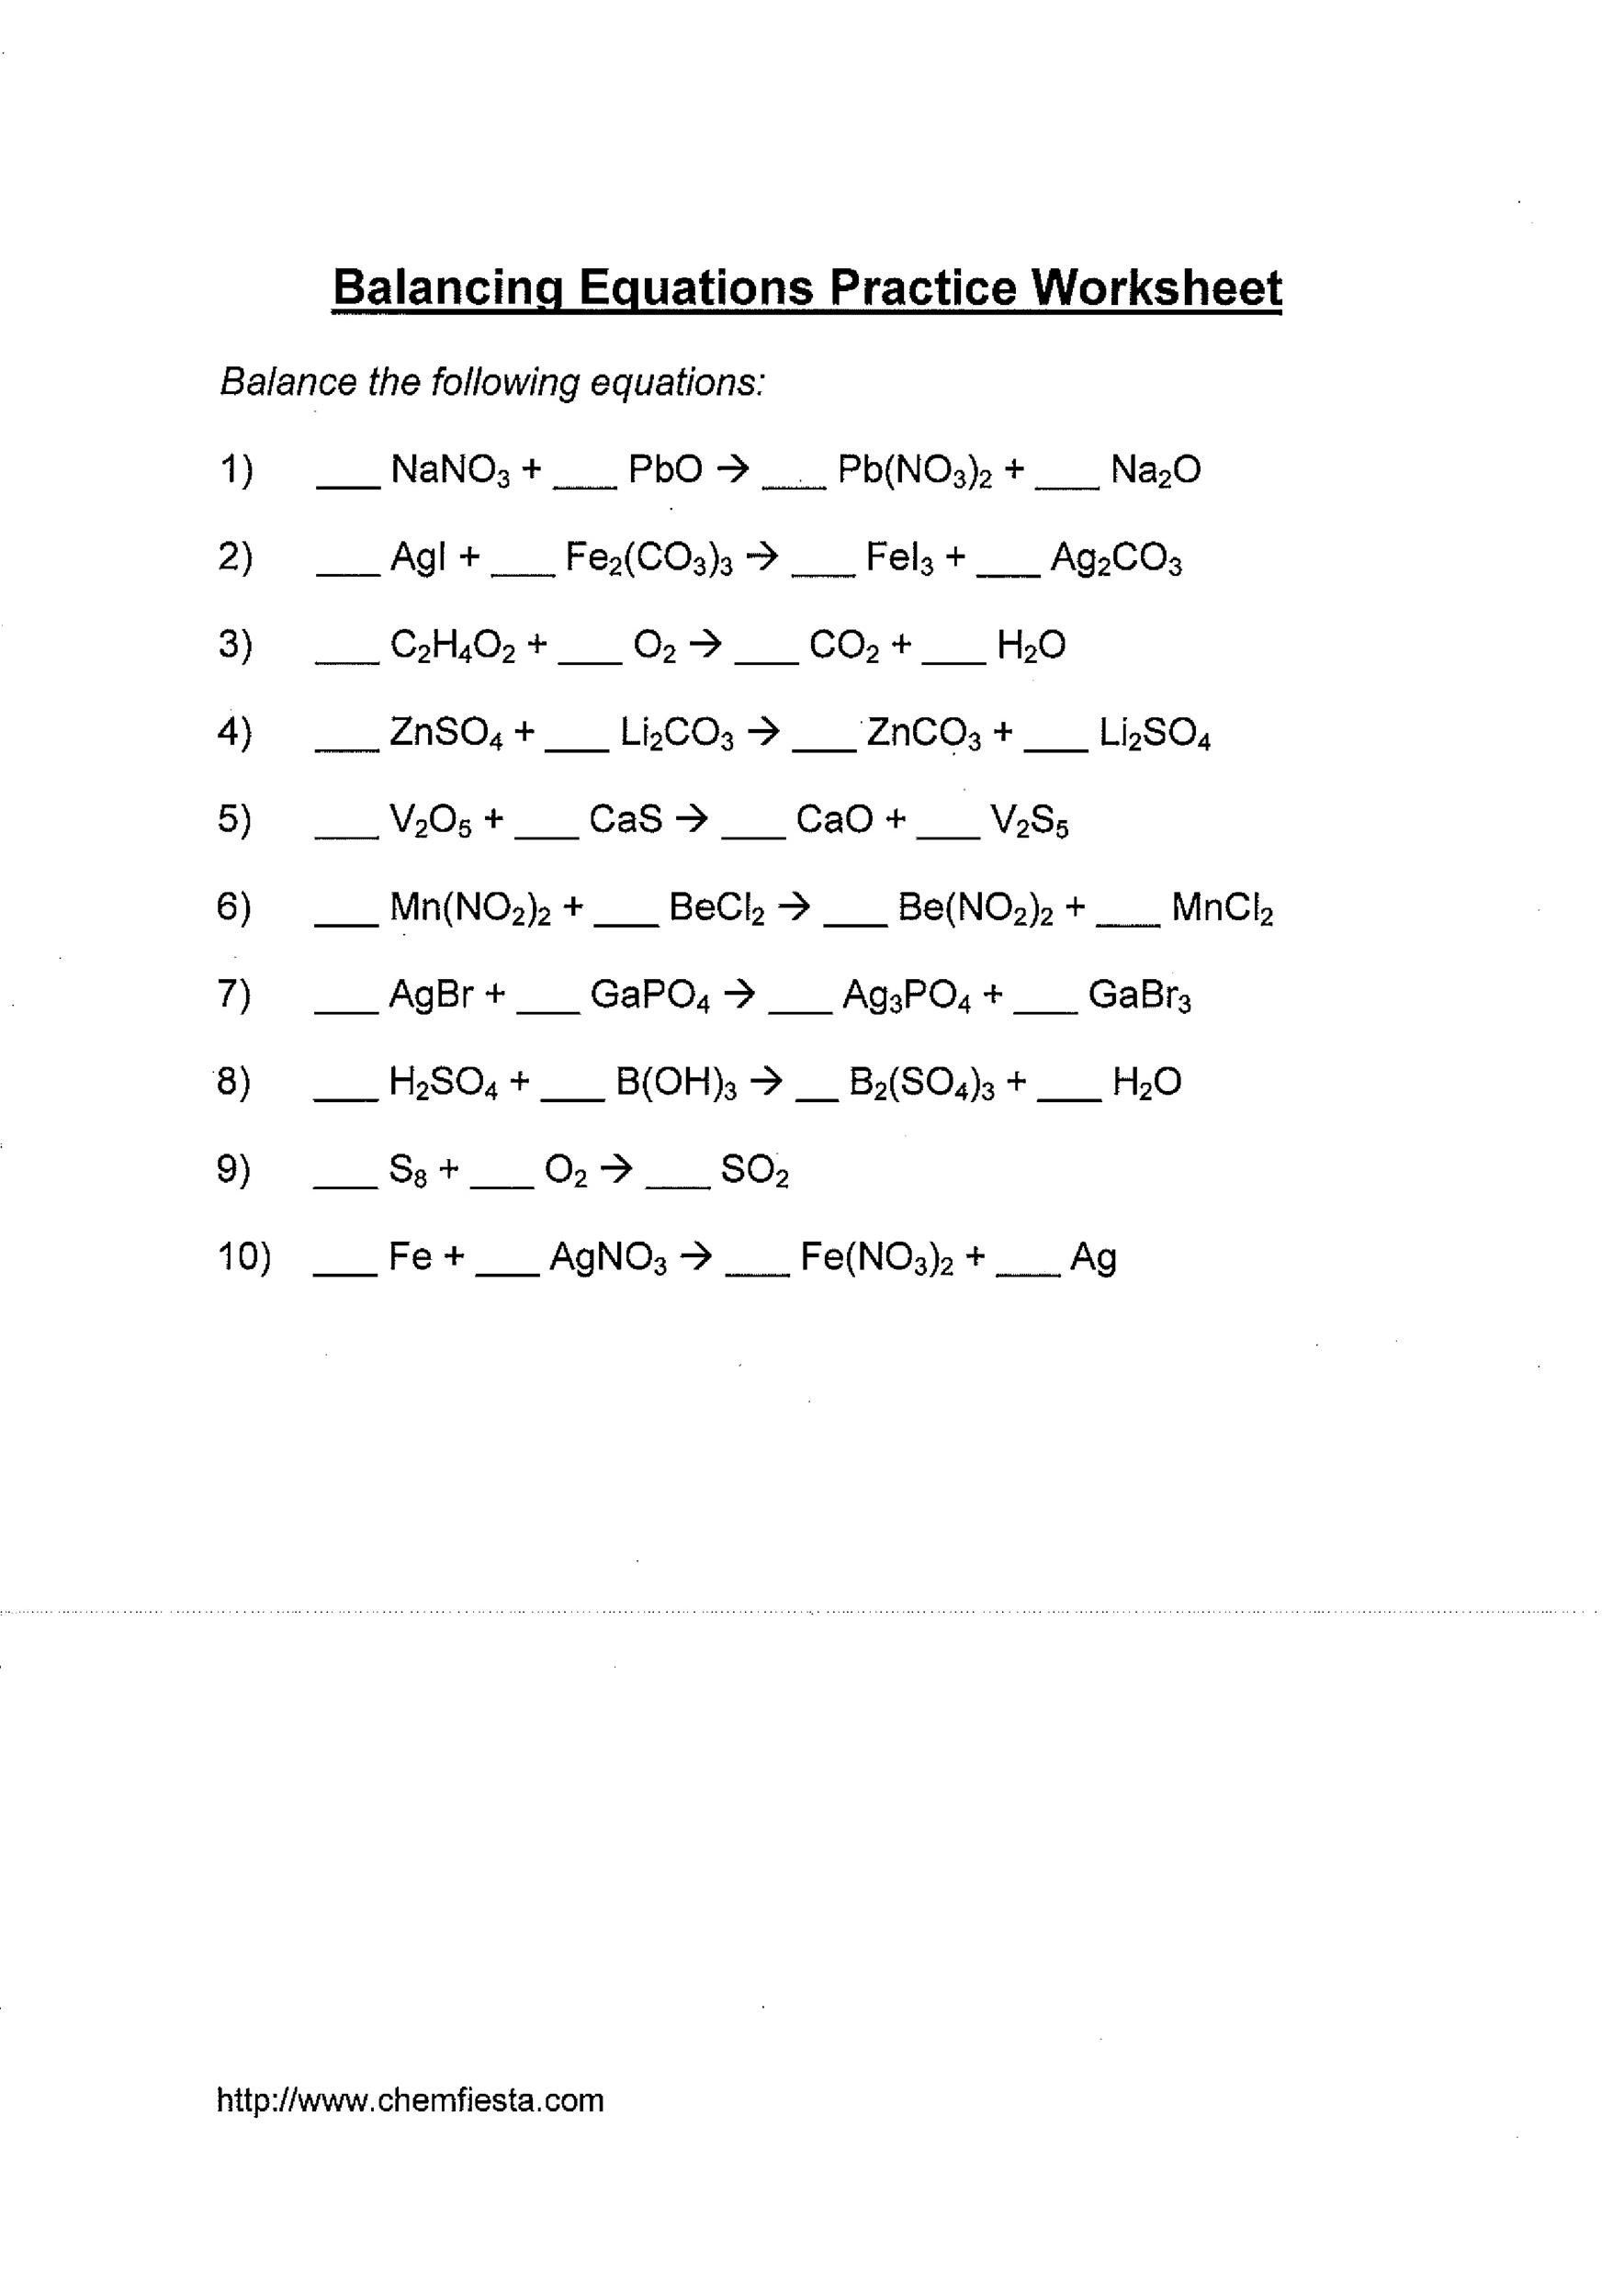 medium resolution of Balanced Equations Worksheet Balancing Act   Printable Worksheets and  Activities for Teachers